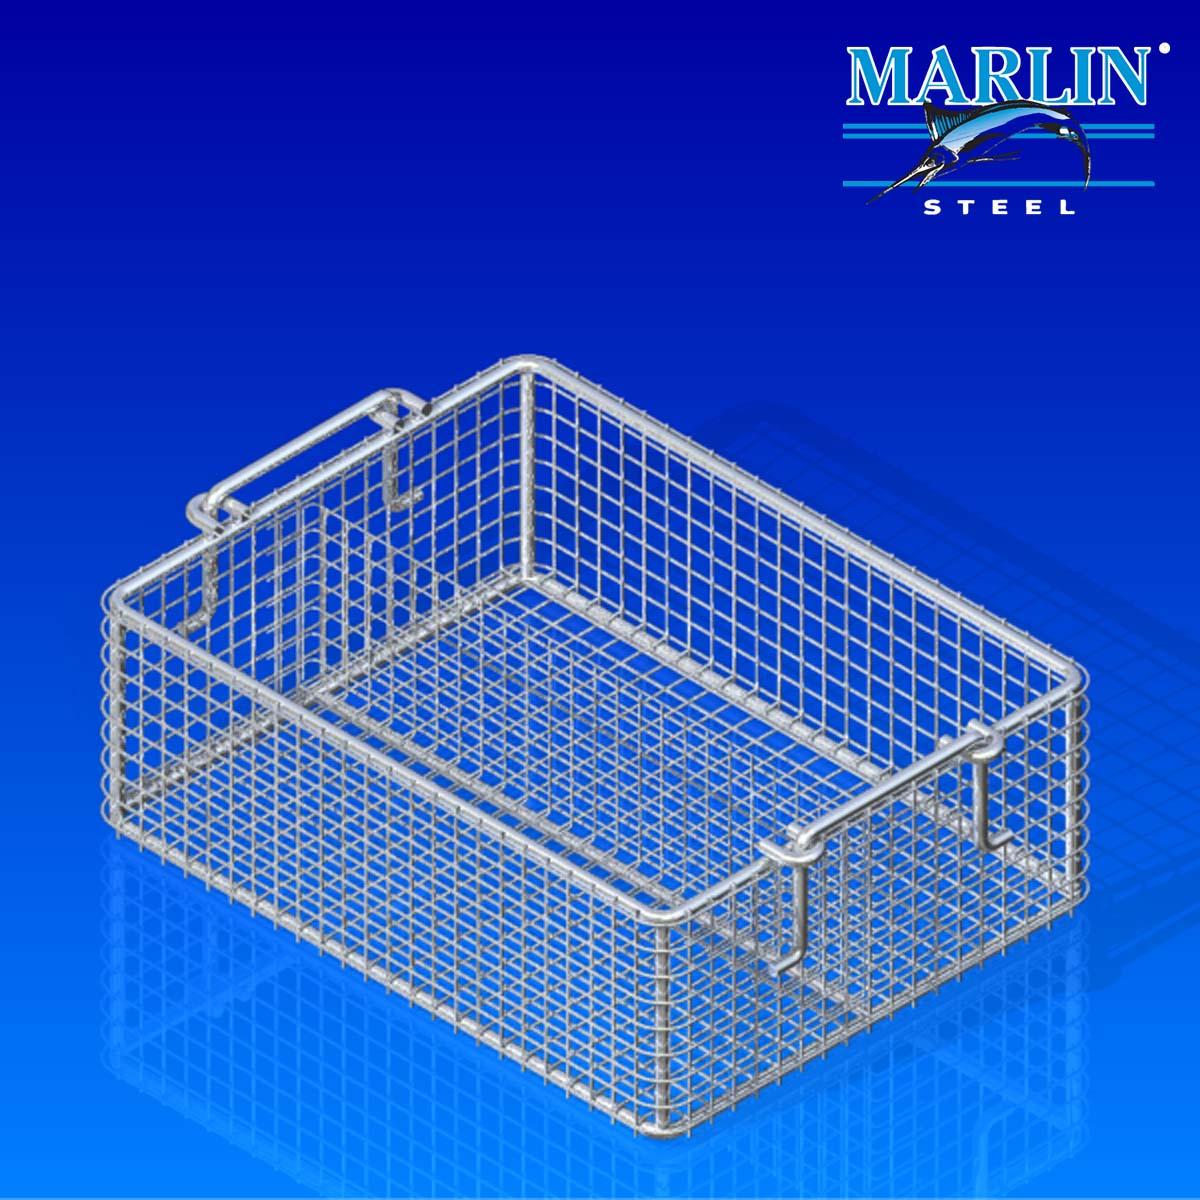 Marlin Steel Basket with Handles 775001